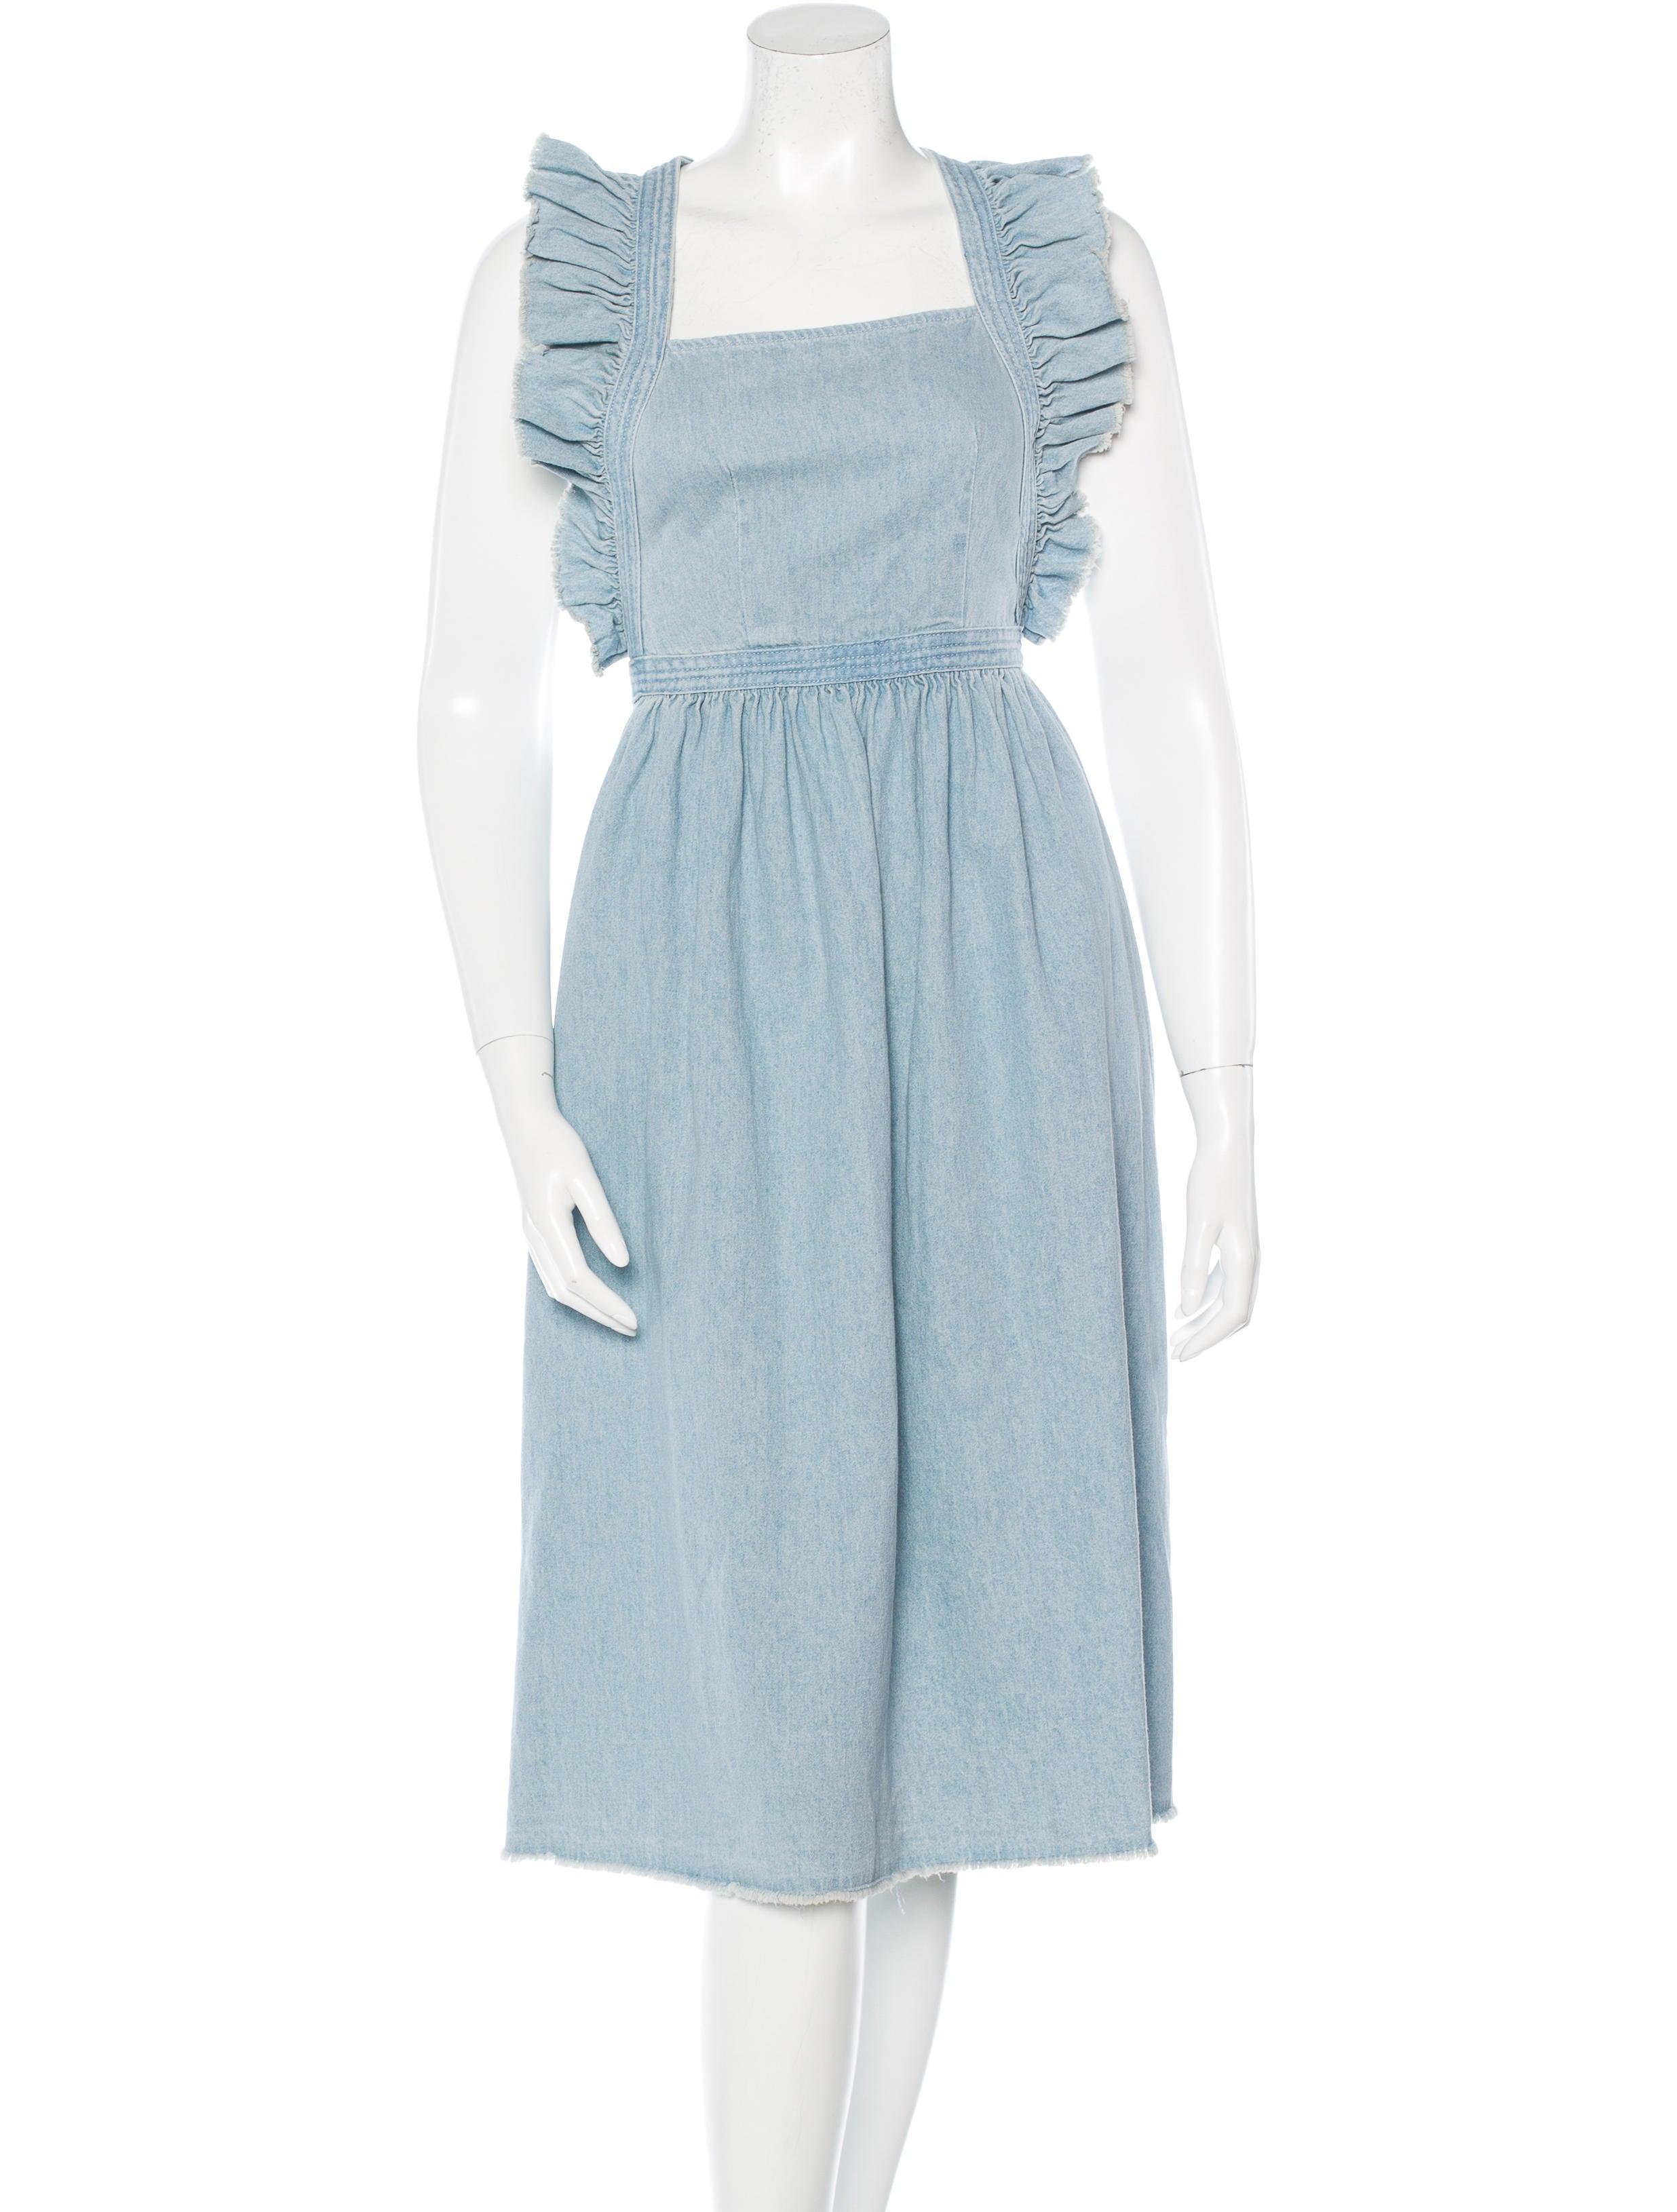 6b8519672a0 Ulla Johnson Denim Midi Dress - Clothing - WUL21363